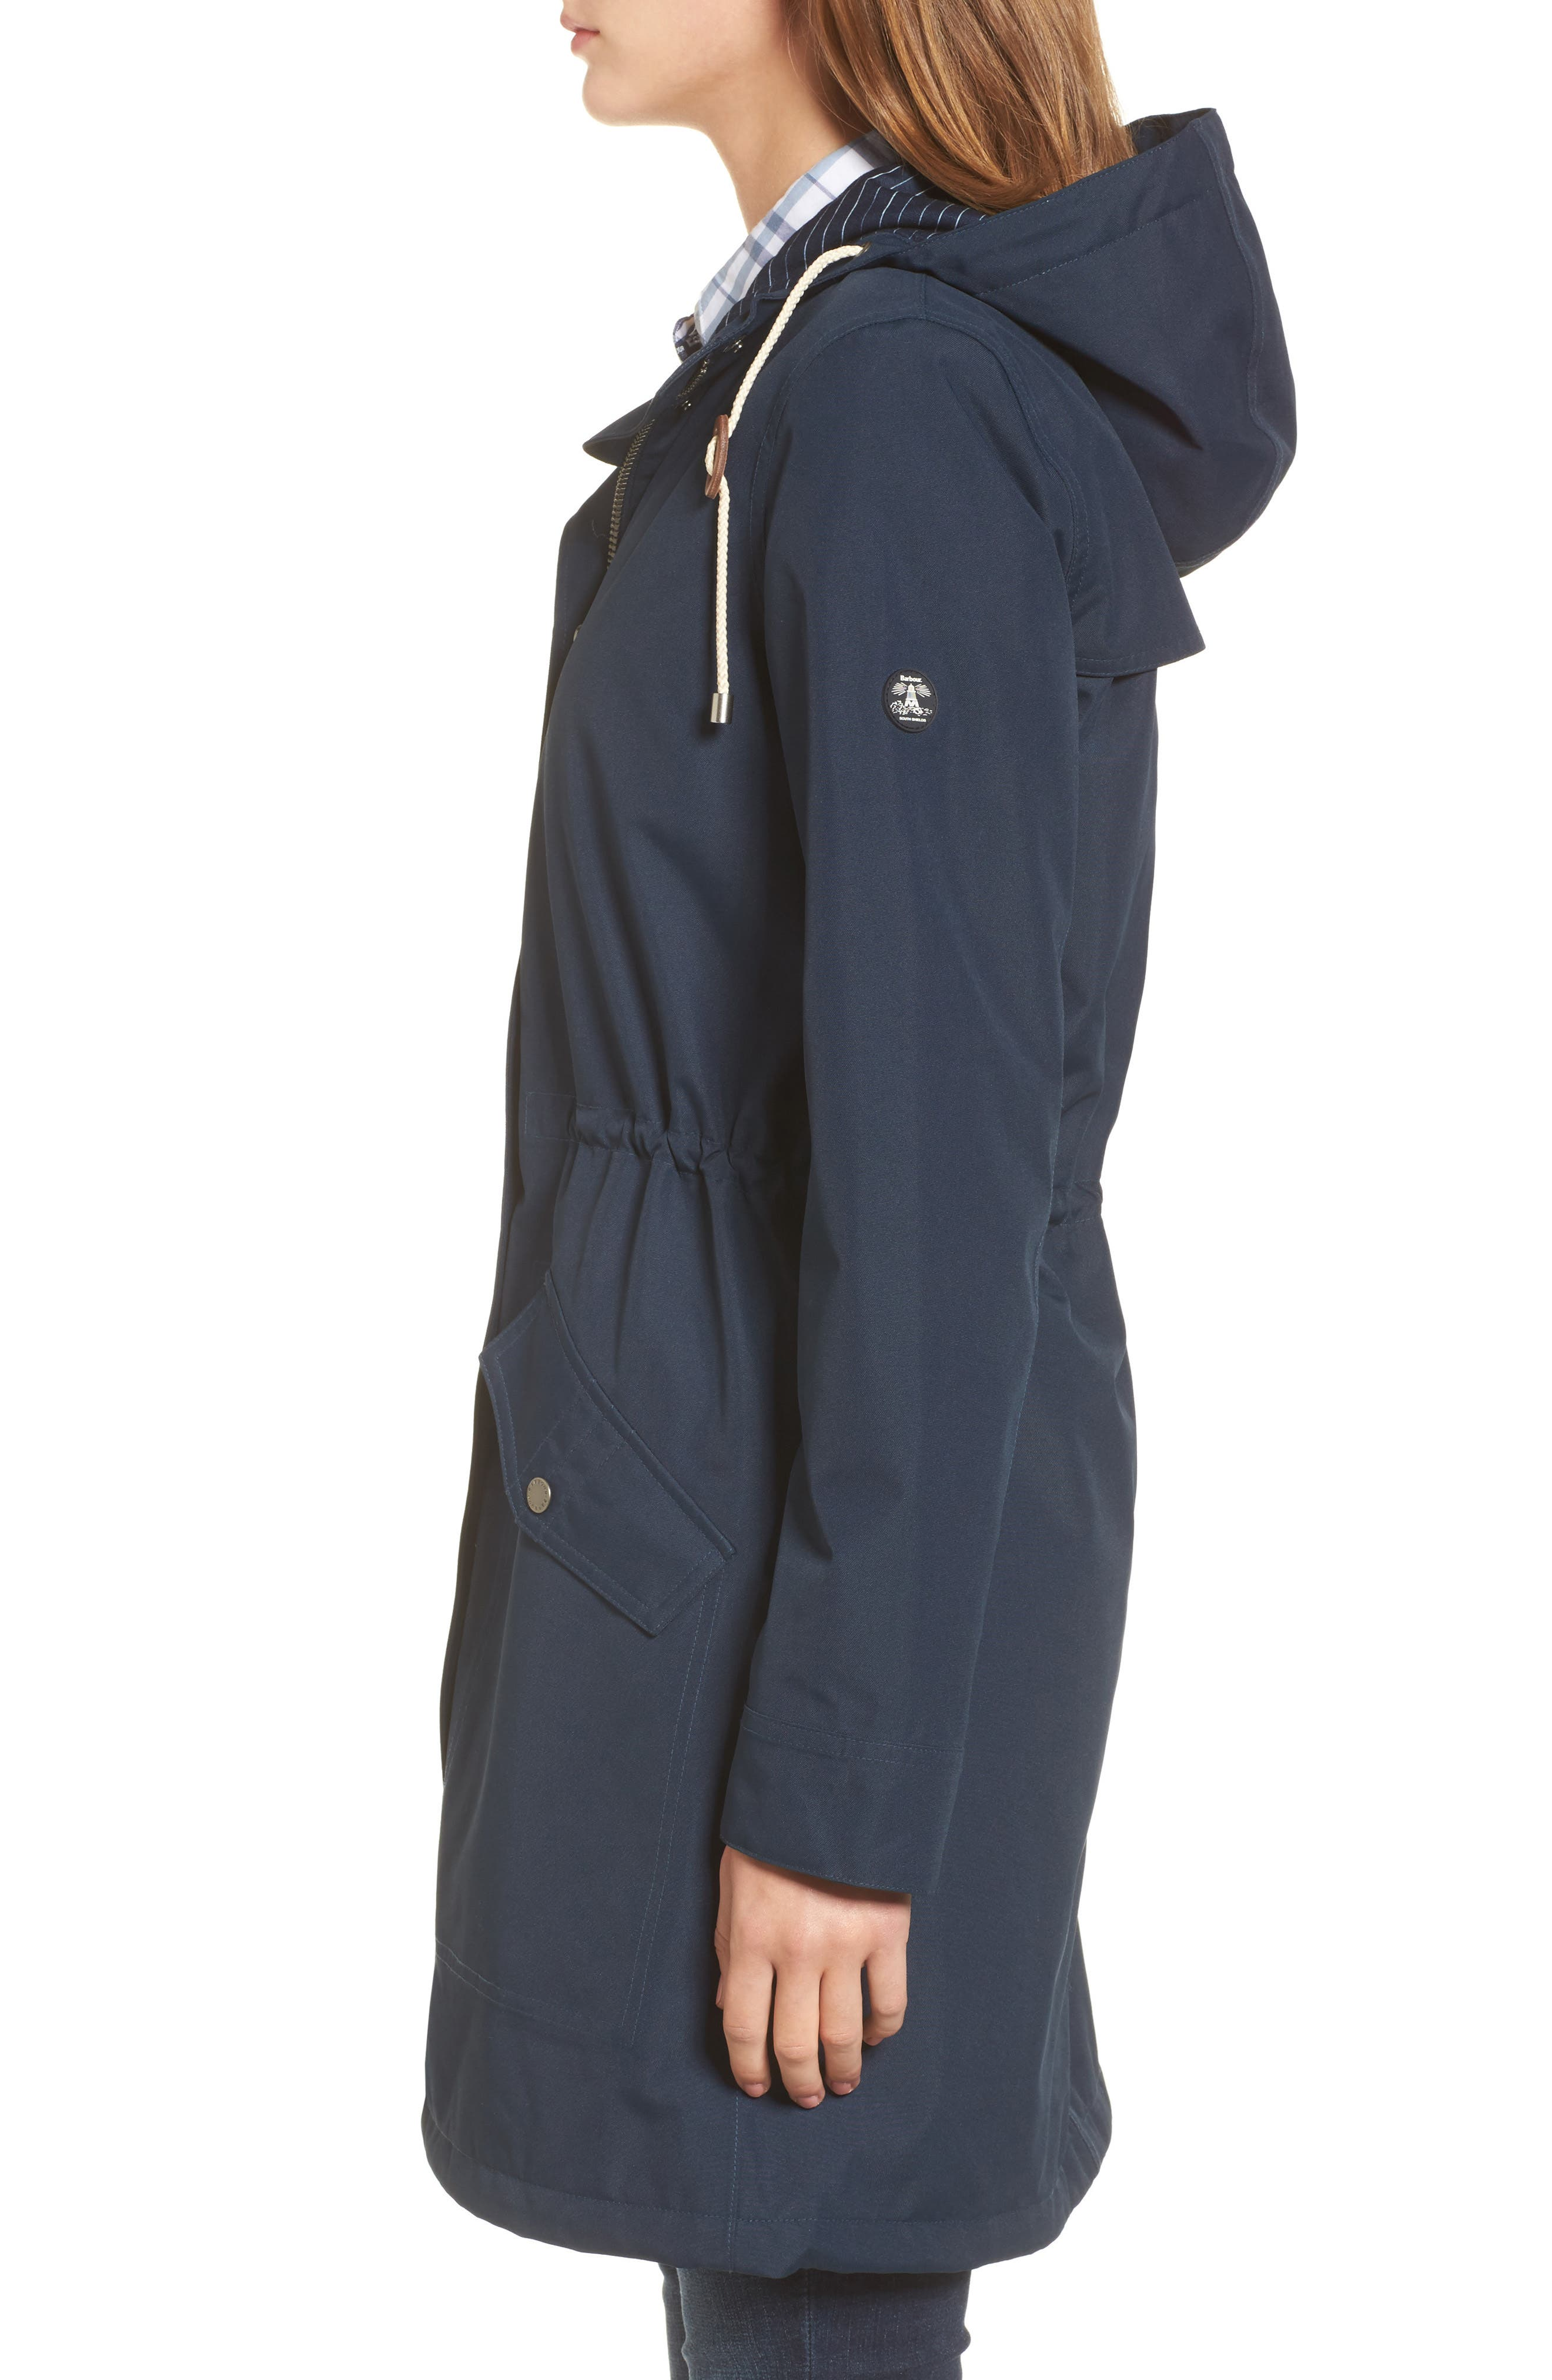 Whitford Anorak Jacket,                             Alternate thumbnail 3, color,                             Navy